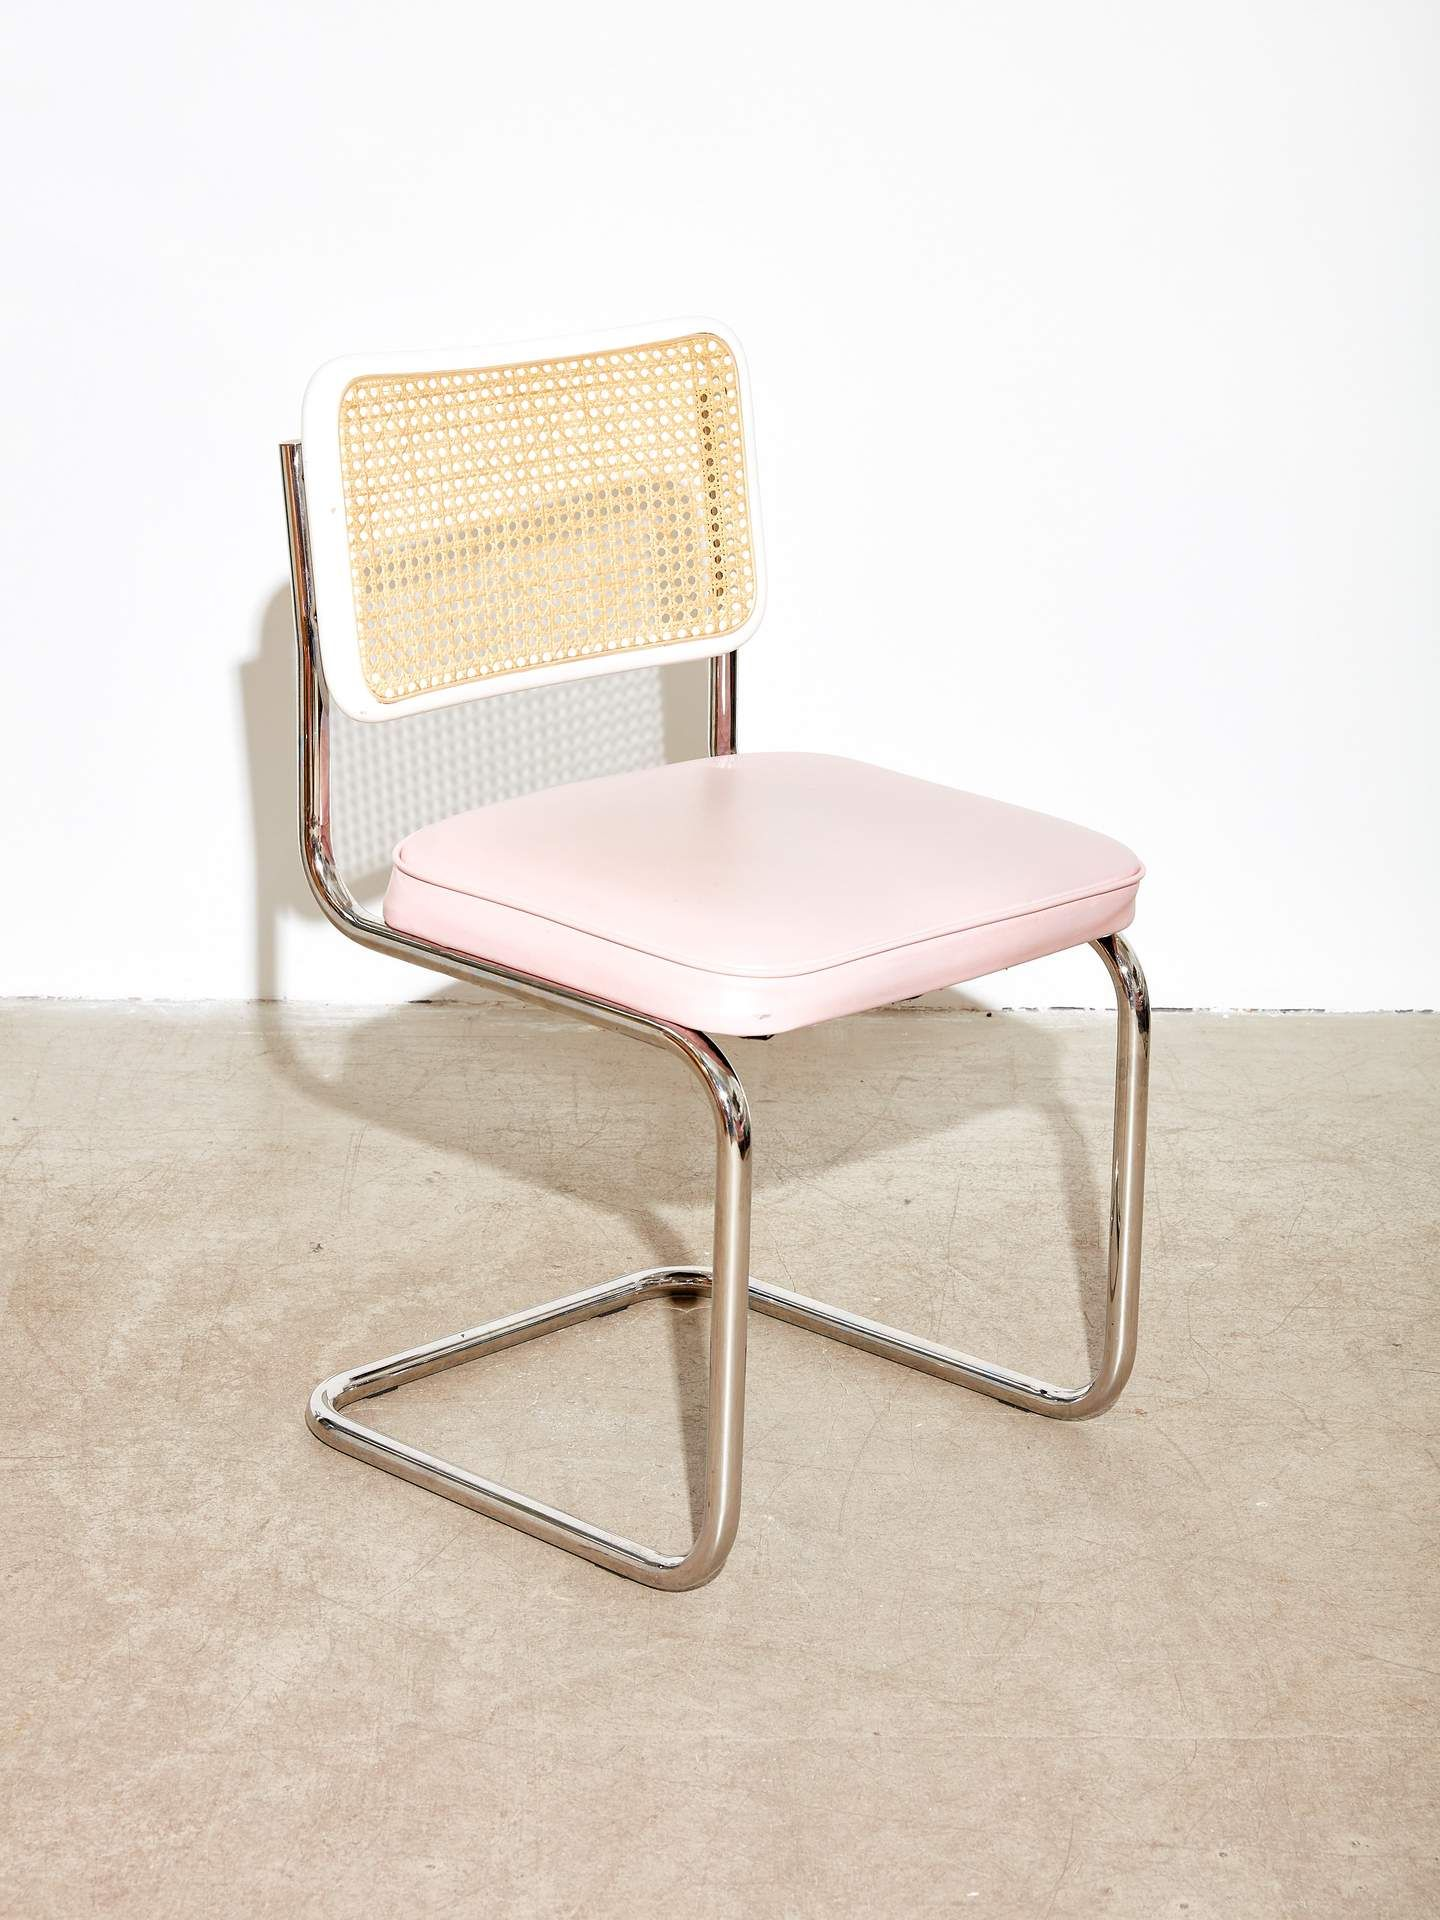 676e17384c45 Breuer Cesca-Style Dining Chair